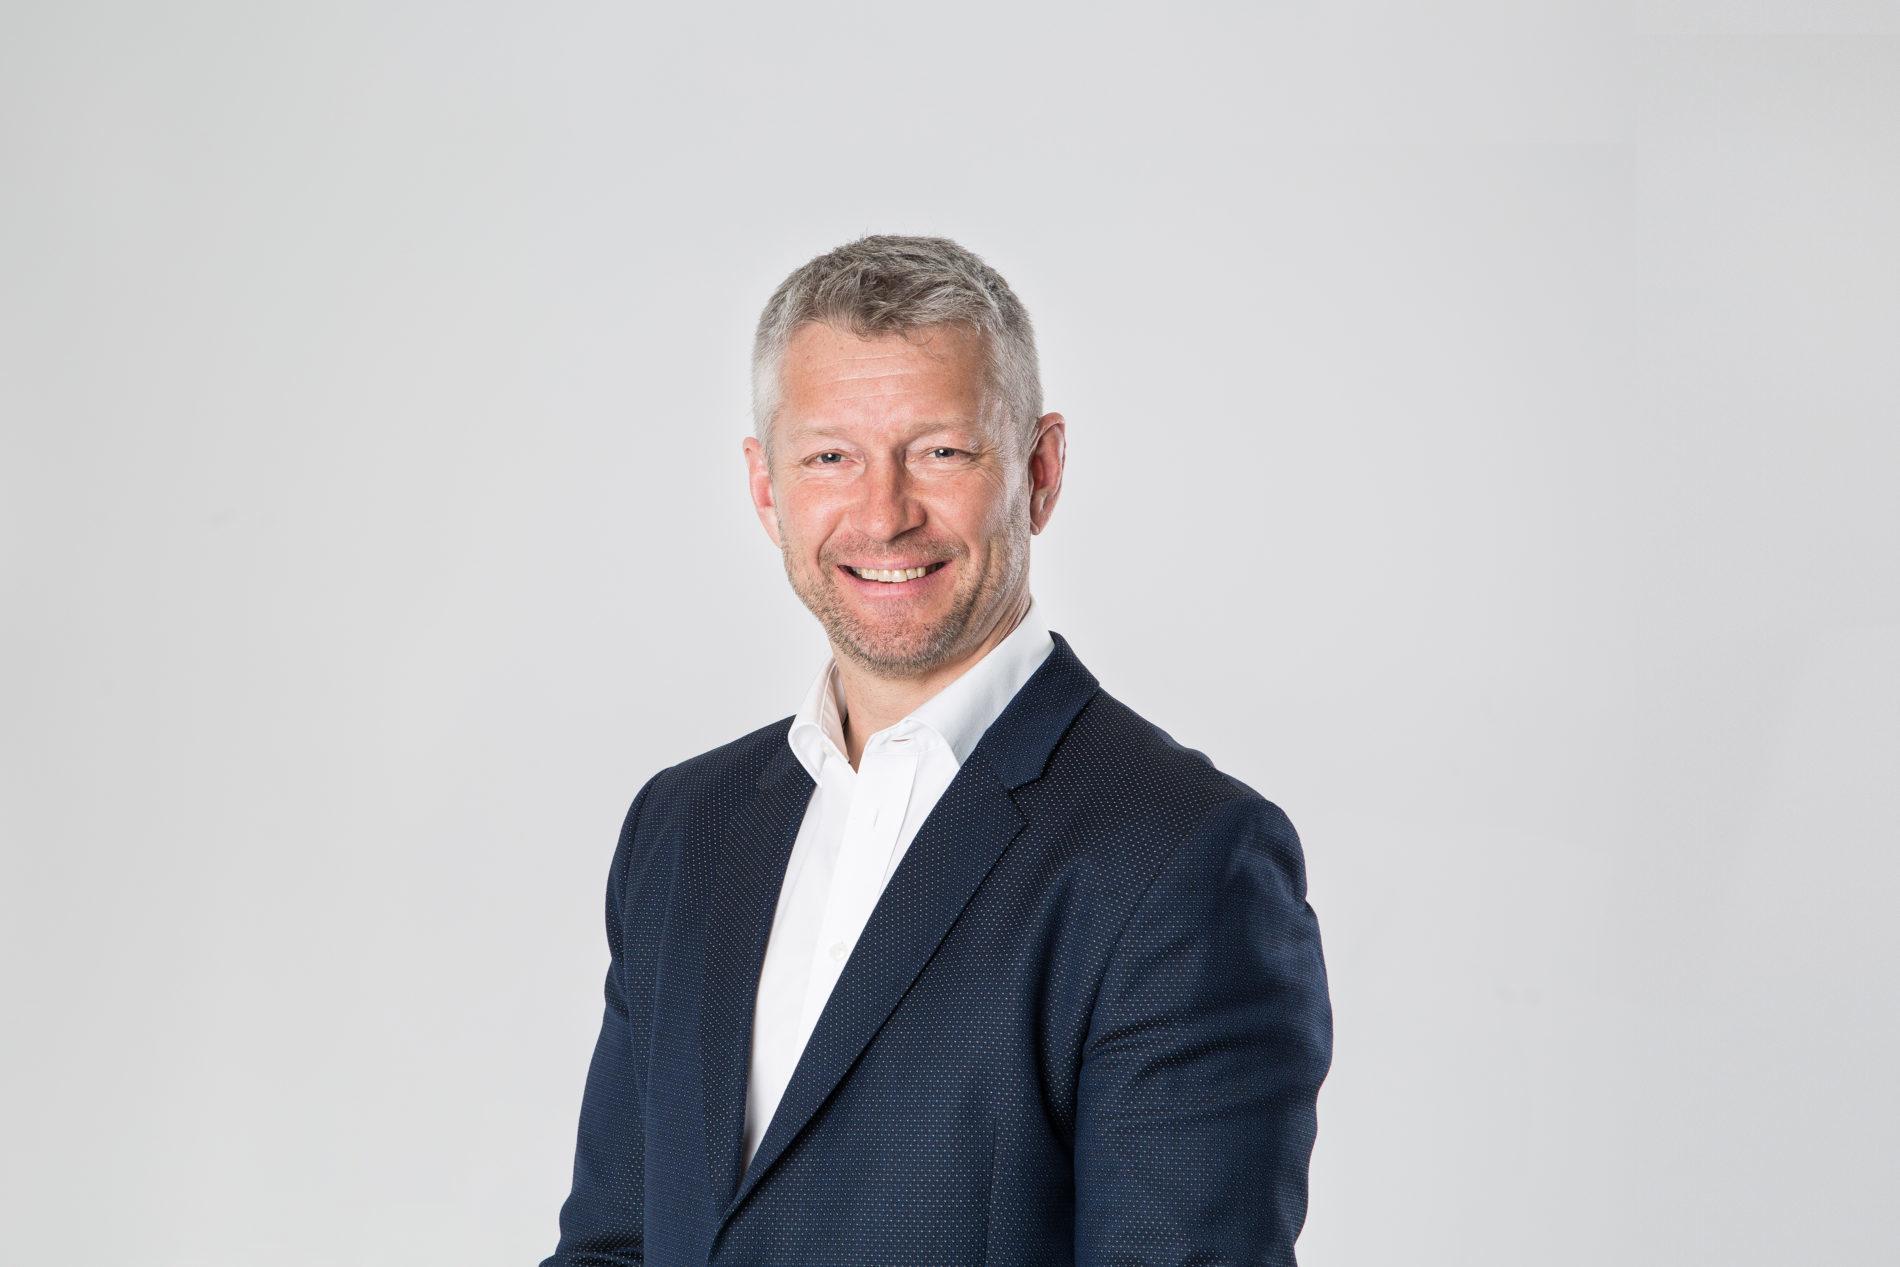 Niklas Simonsson